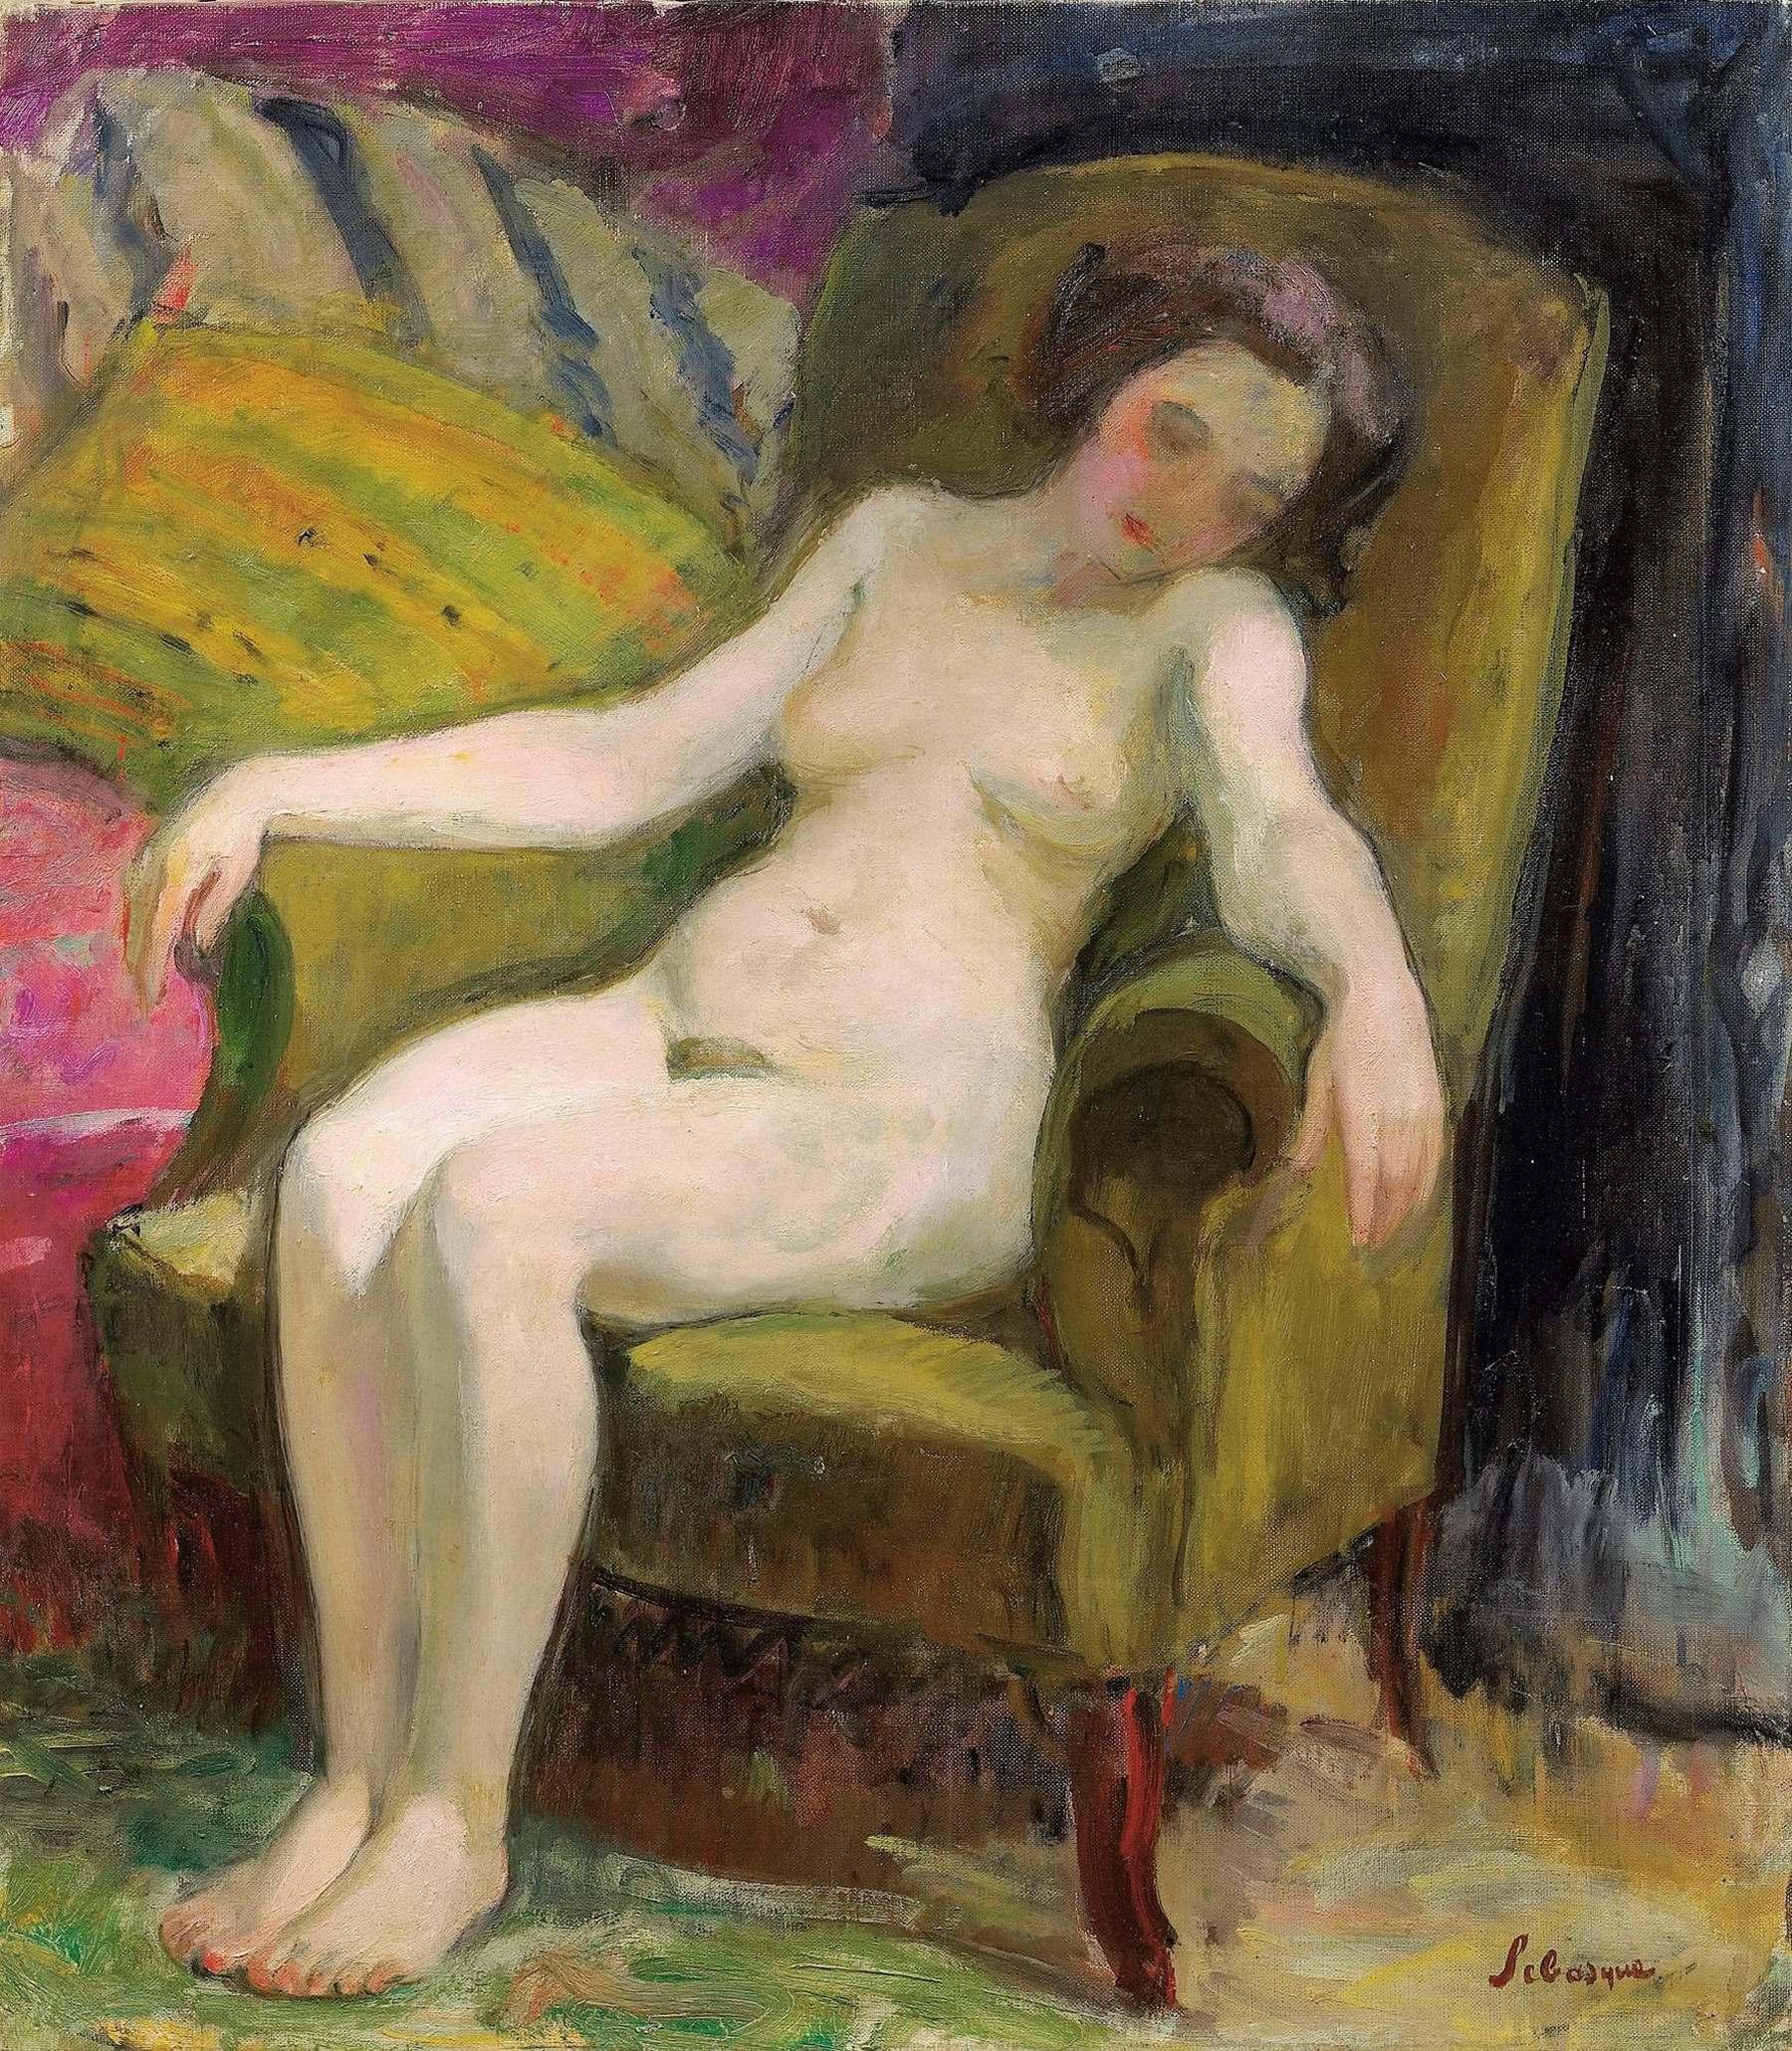 Henri Lebasque, 1865-1937. Обнаженная в кресле. Частная коллекция